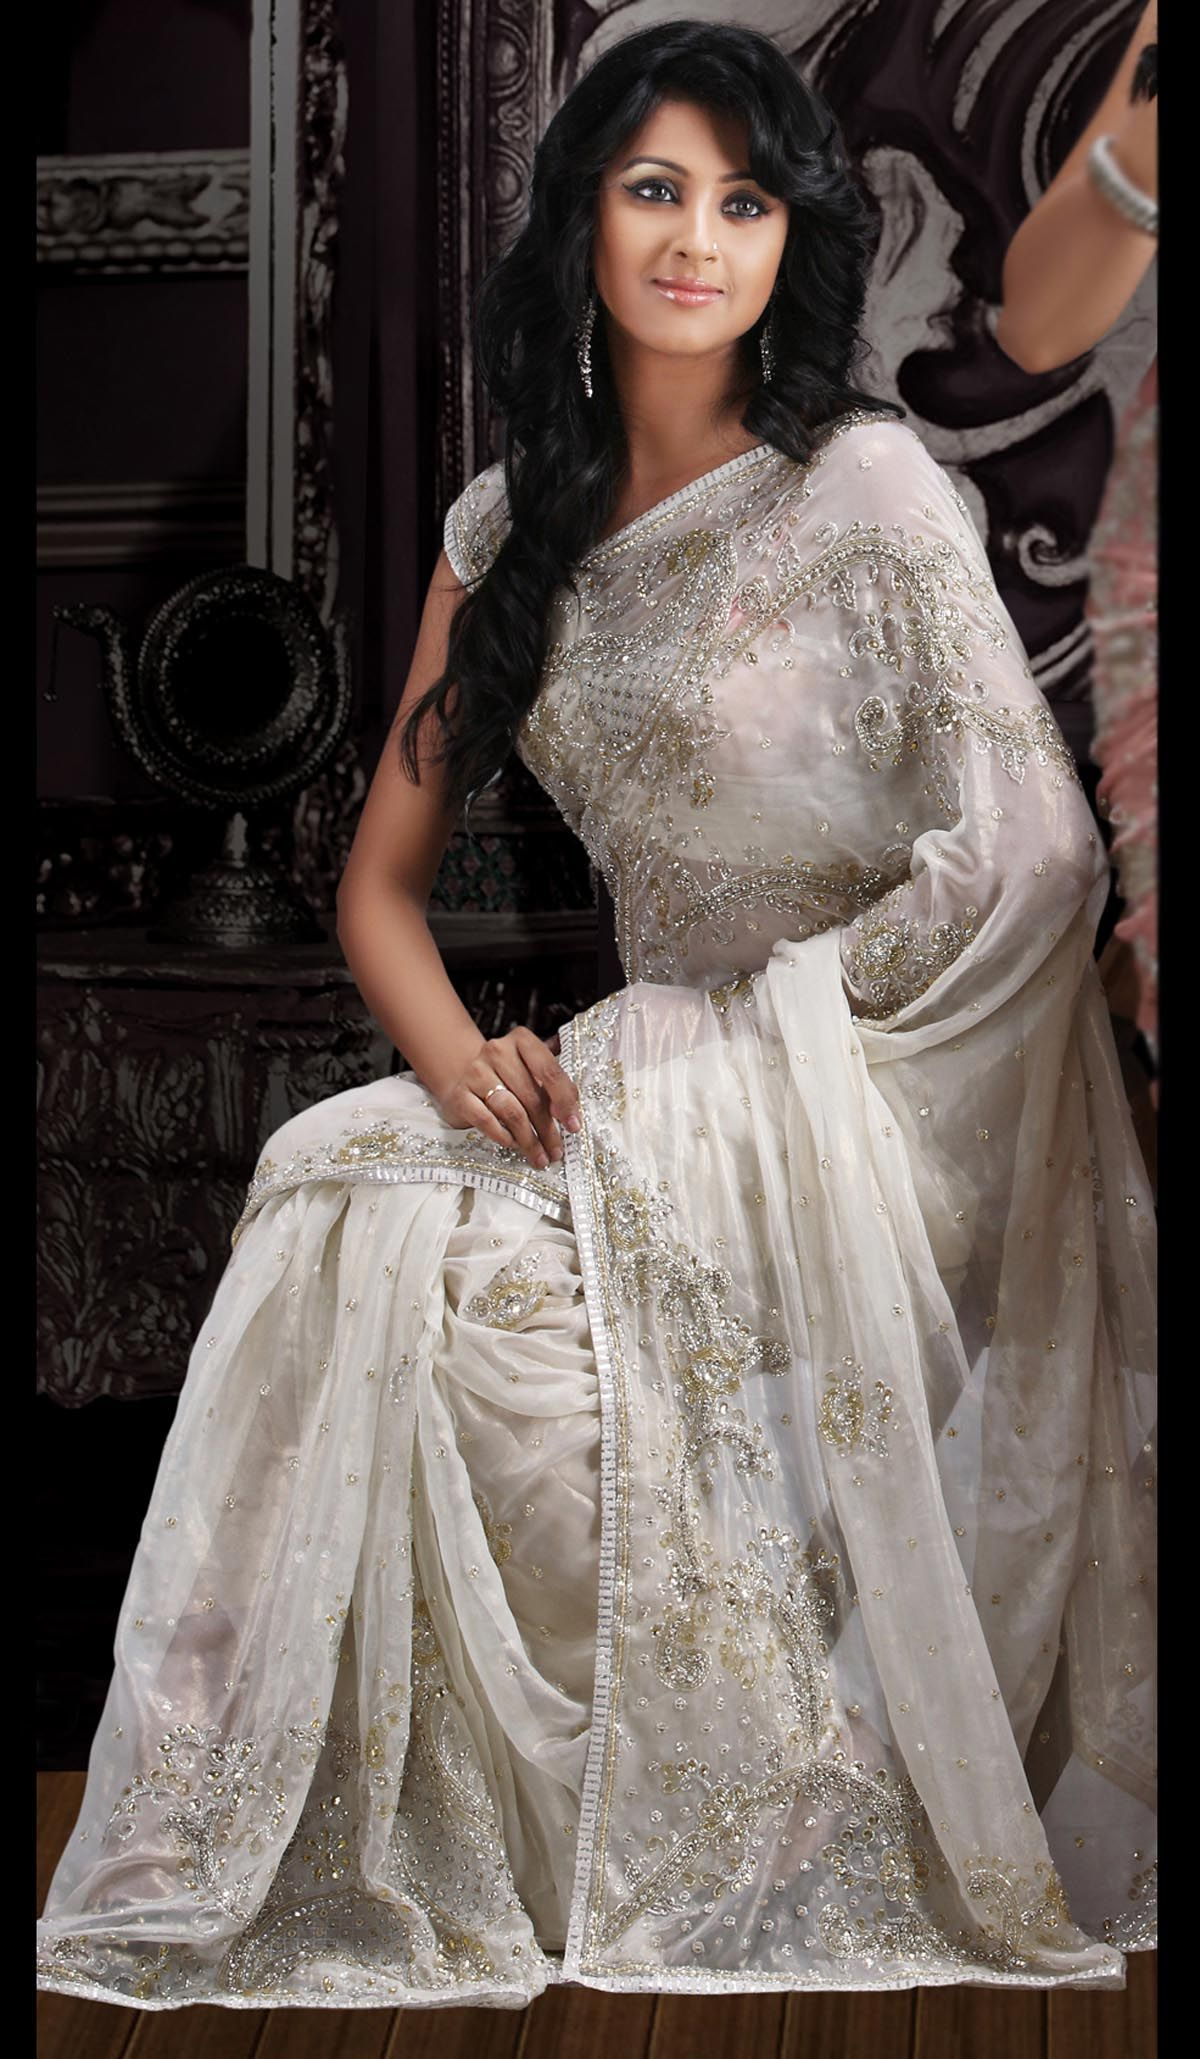 White Saree Tamanna In Veeram: Saree, Saris And White Saree